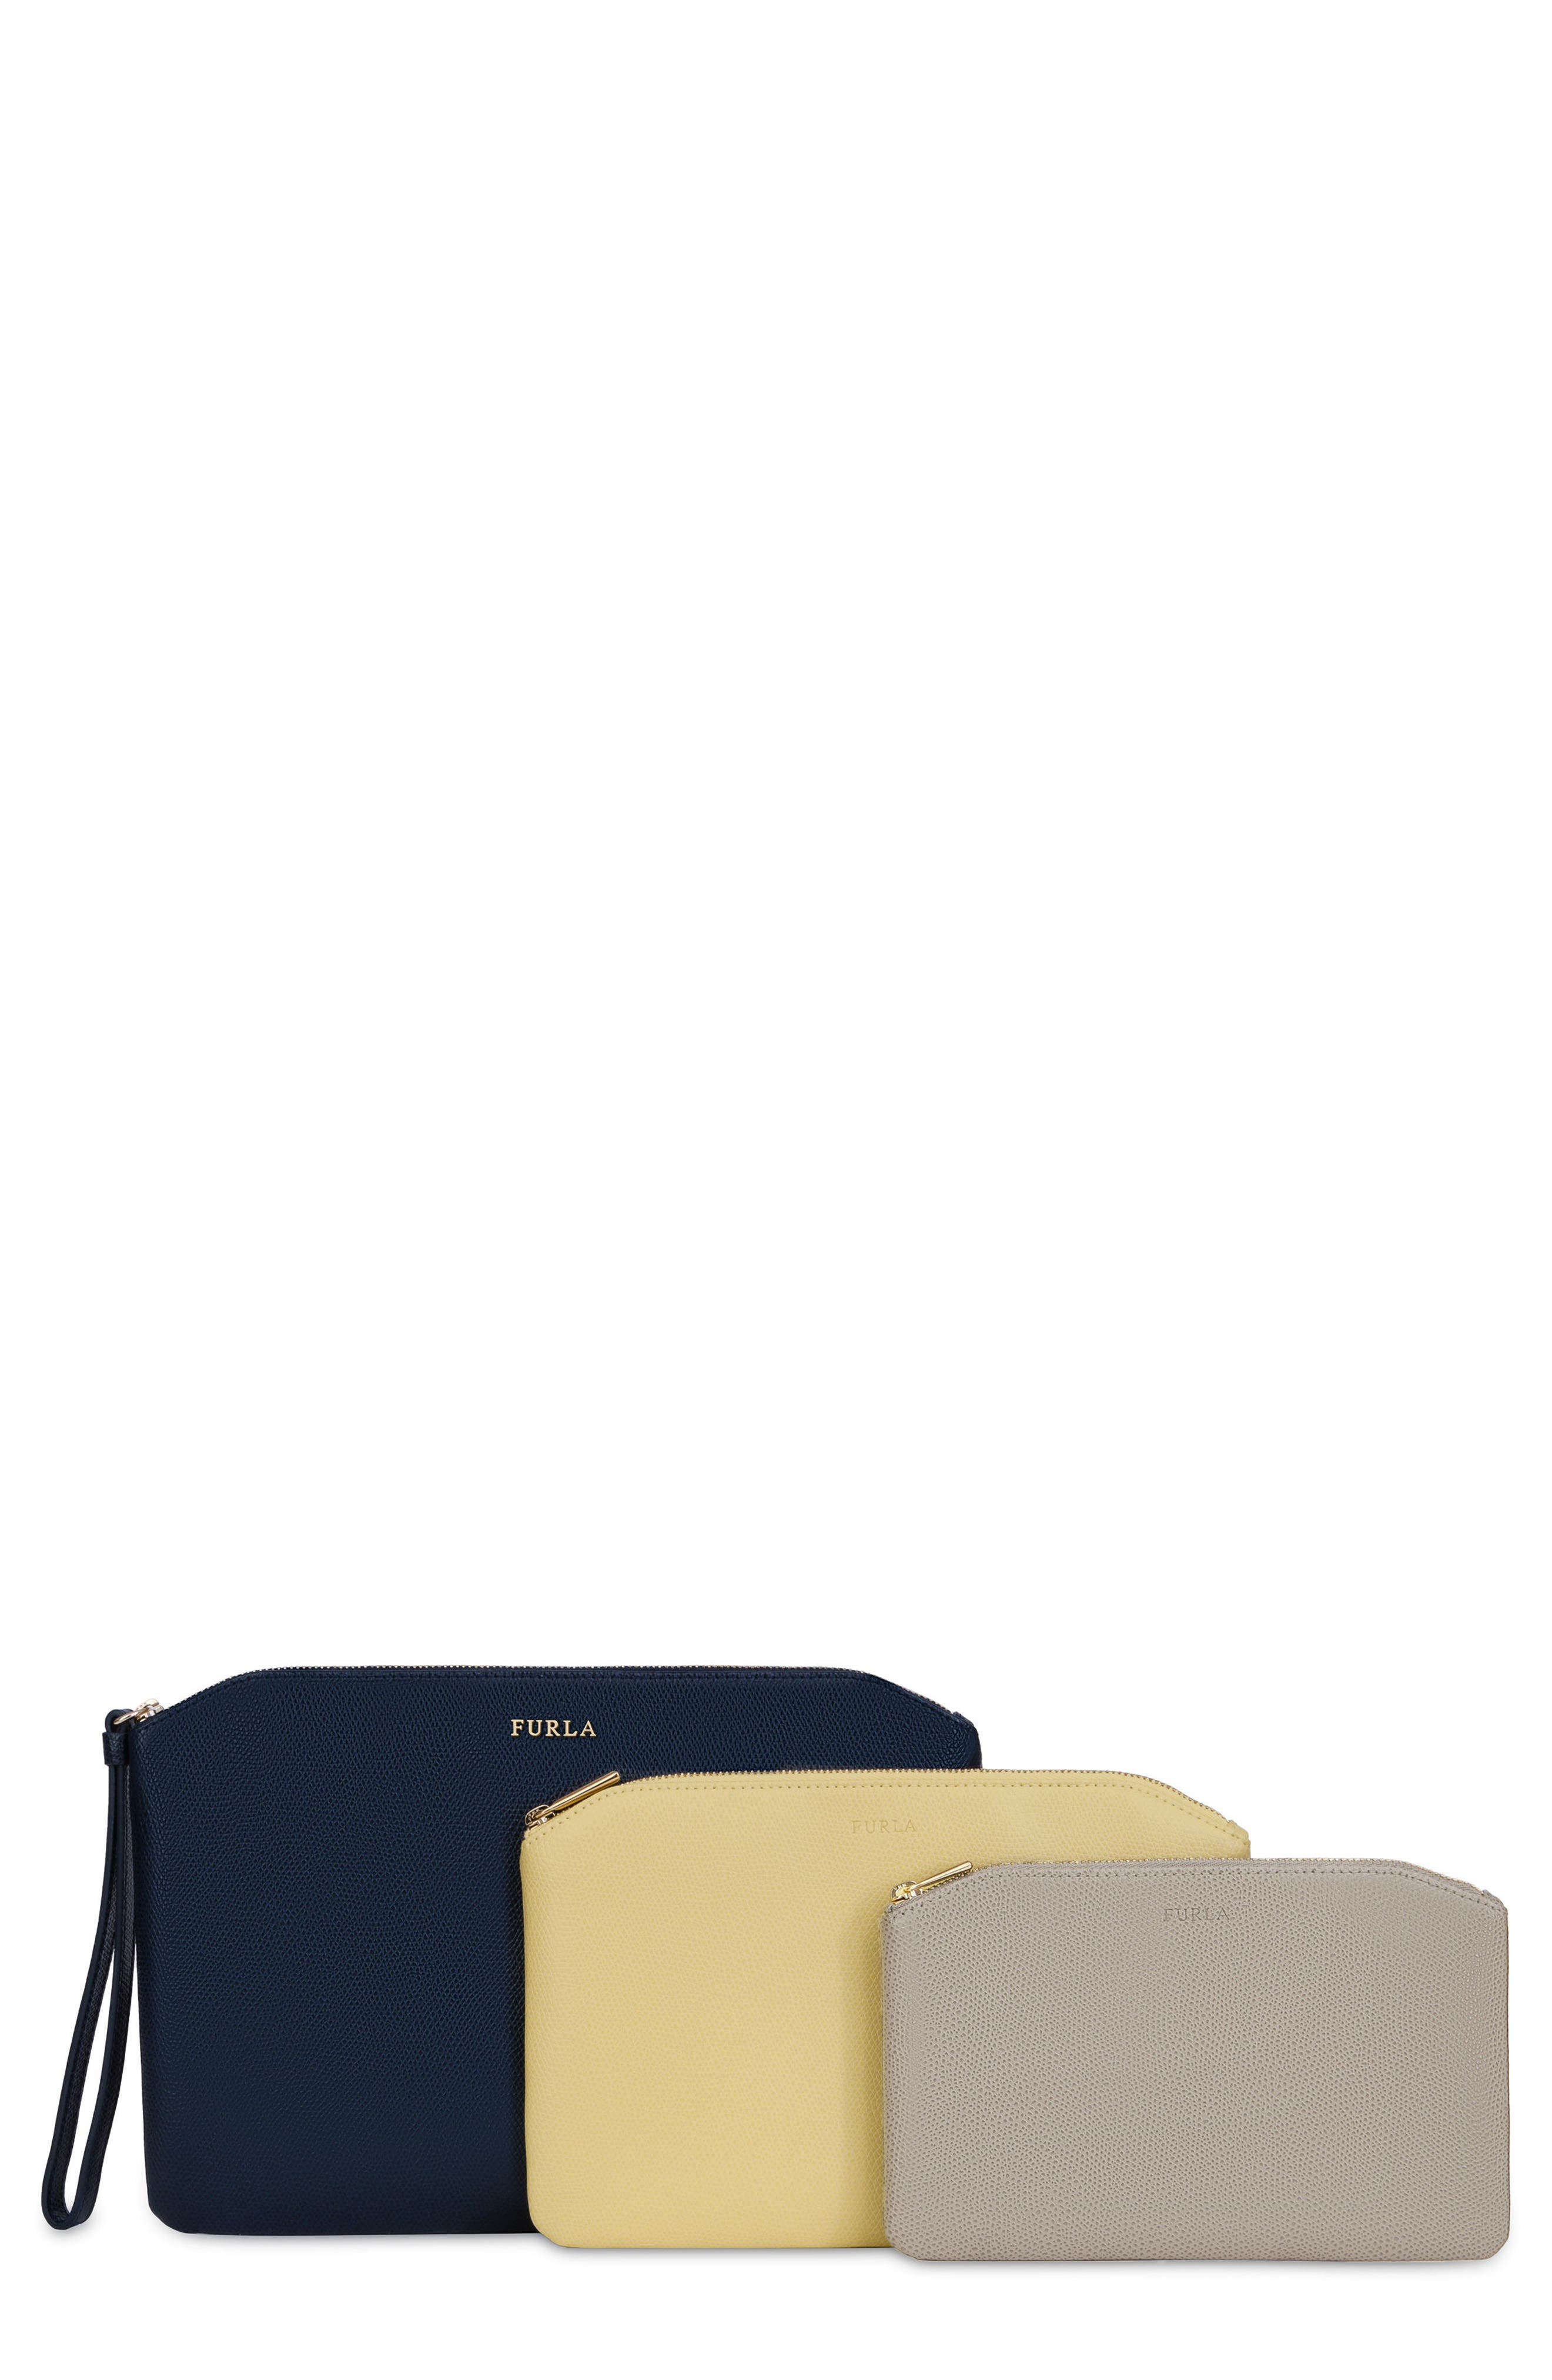 Venere Set of 3 Leather Cosmetic Bags,                         Main,                         color, Blu/ Cedro/ Sabbia